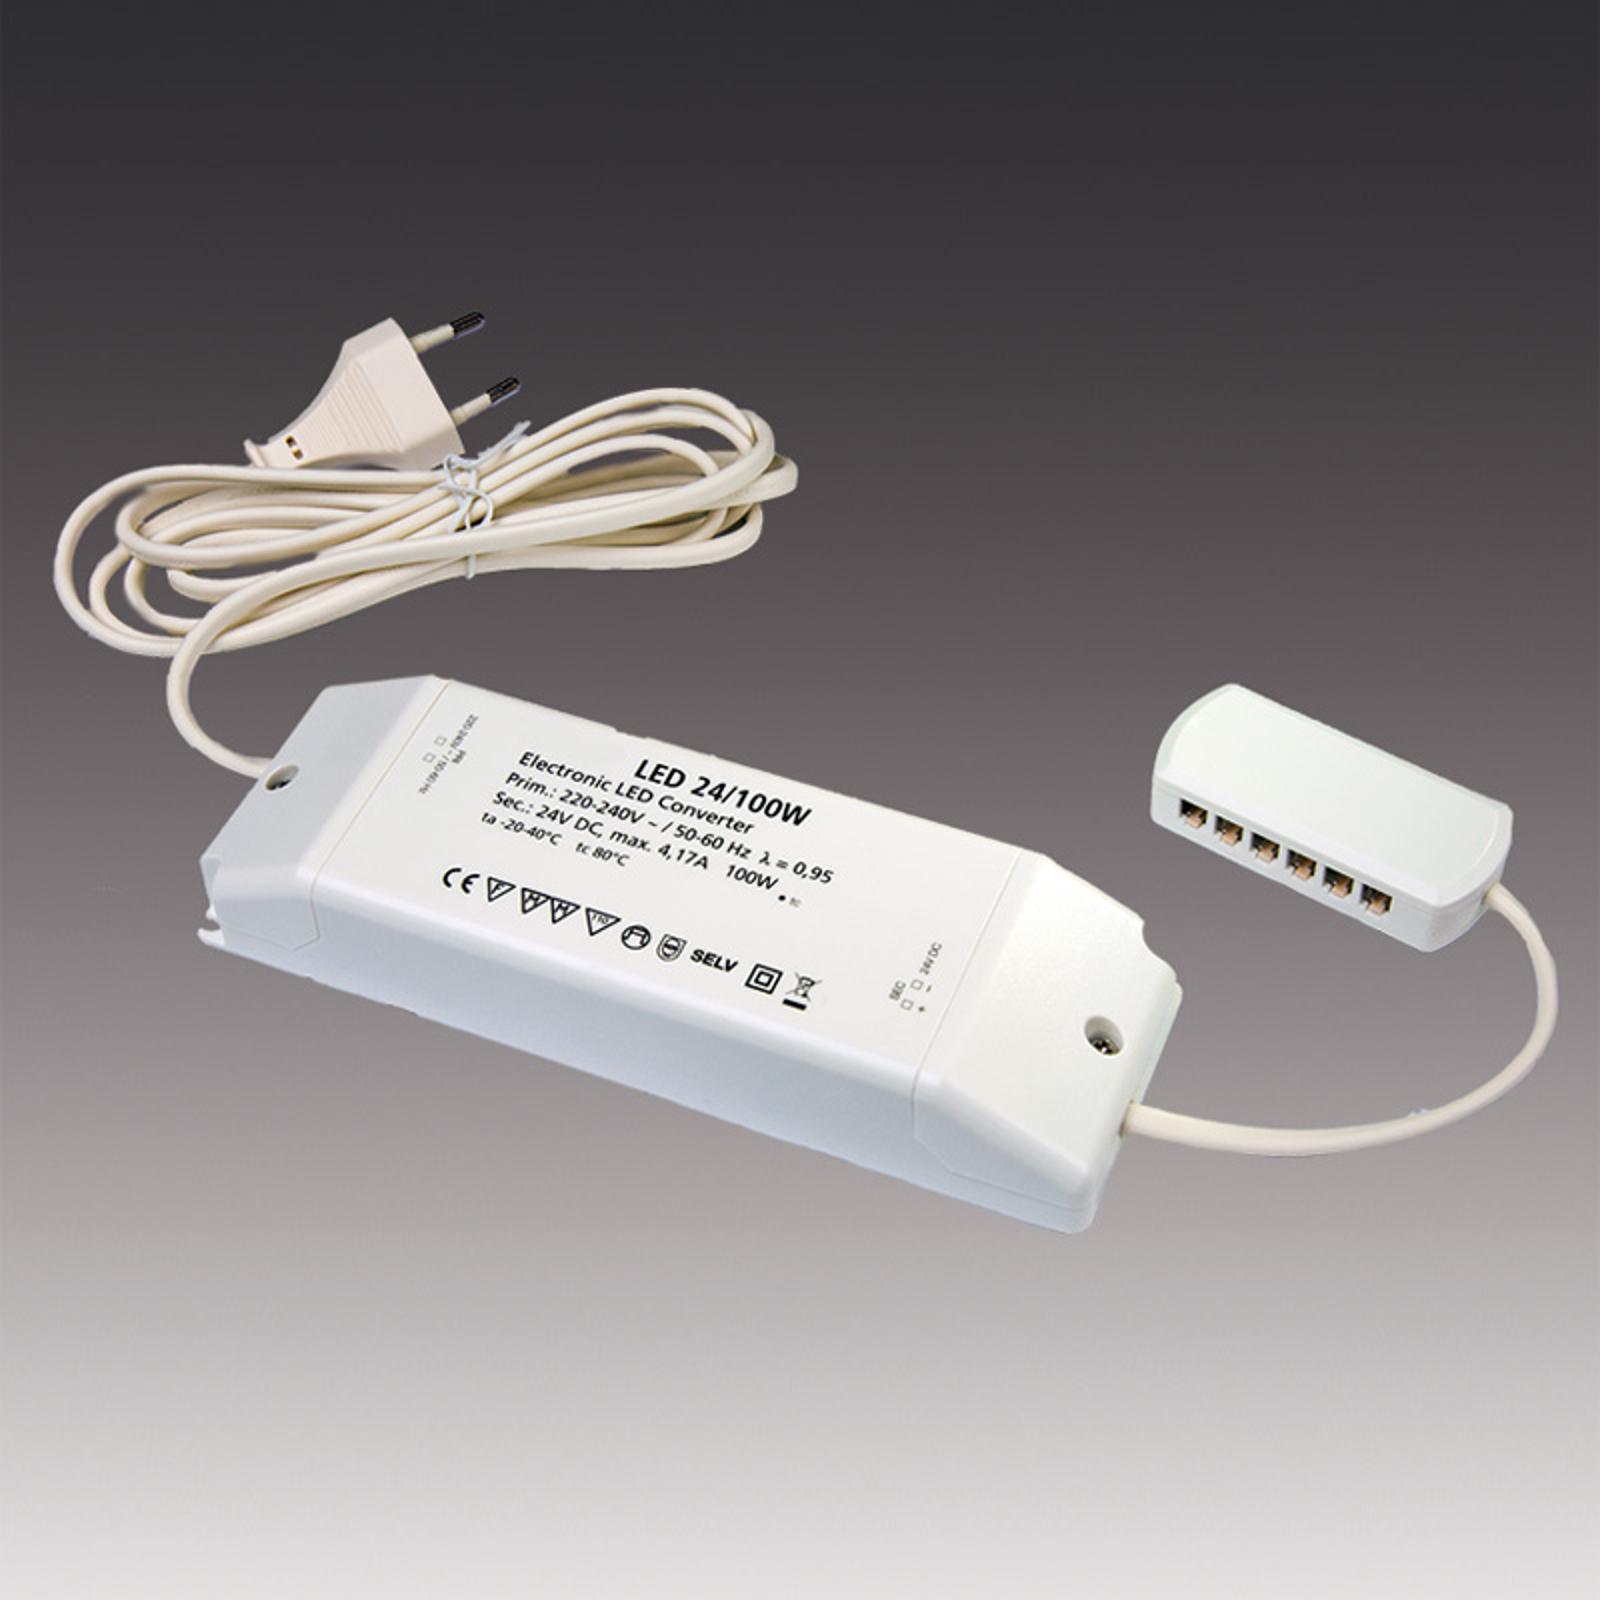 Trafo LED 24/100W DC 24 V